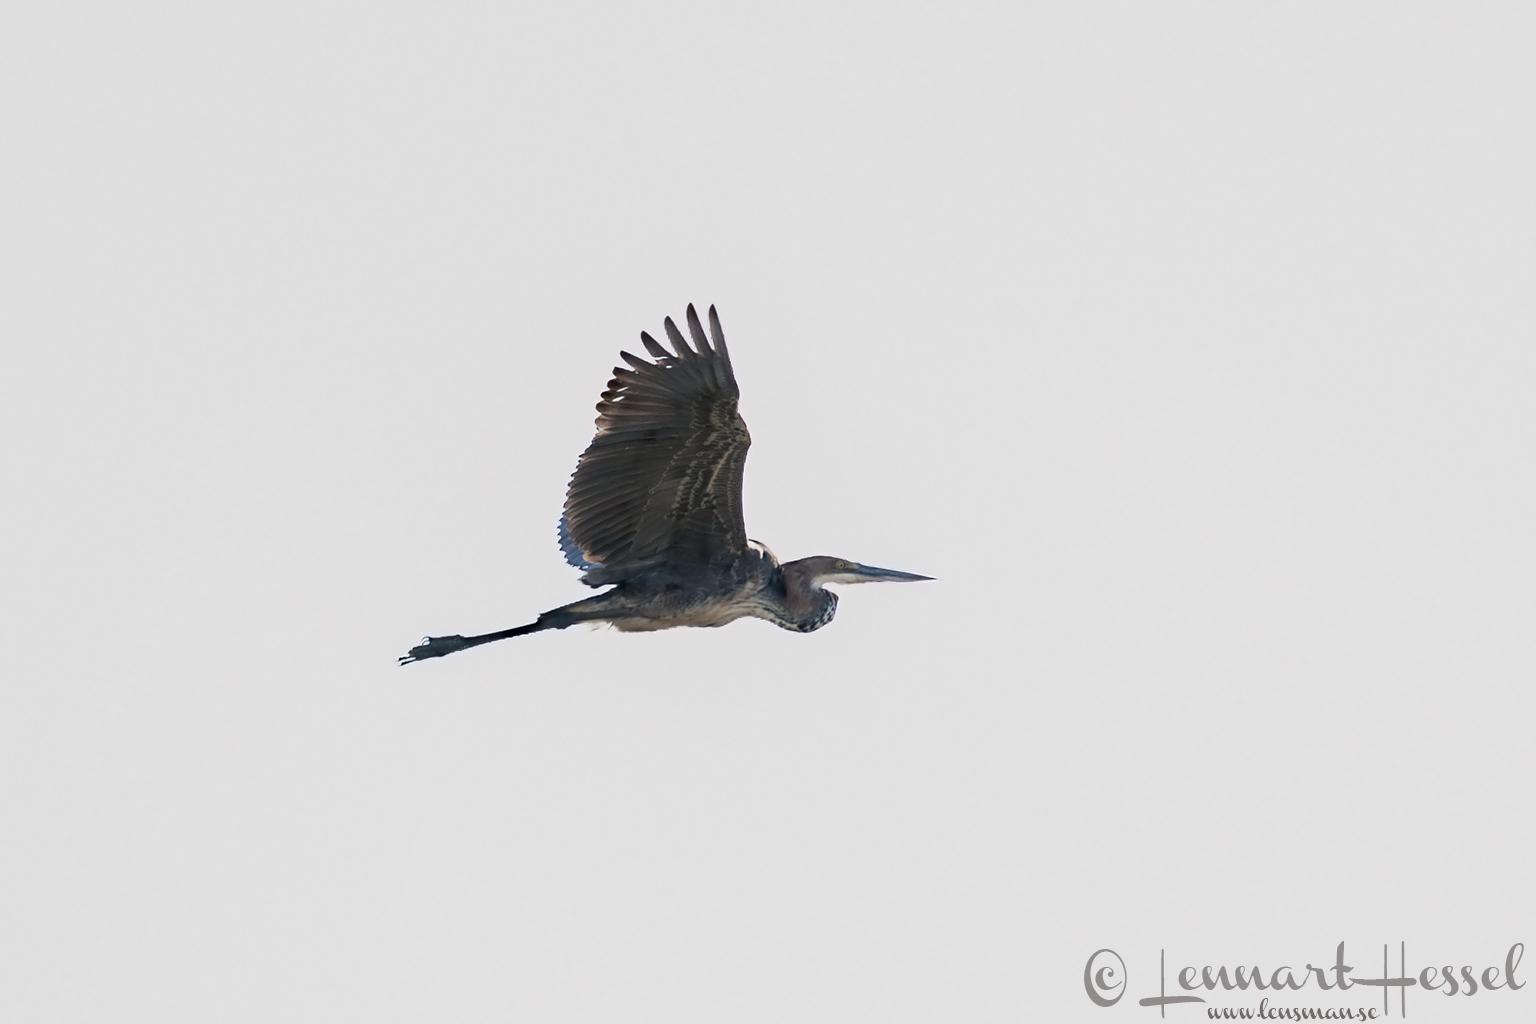 Purple Heron in Moremi Game Reserve, Botswana